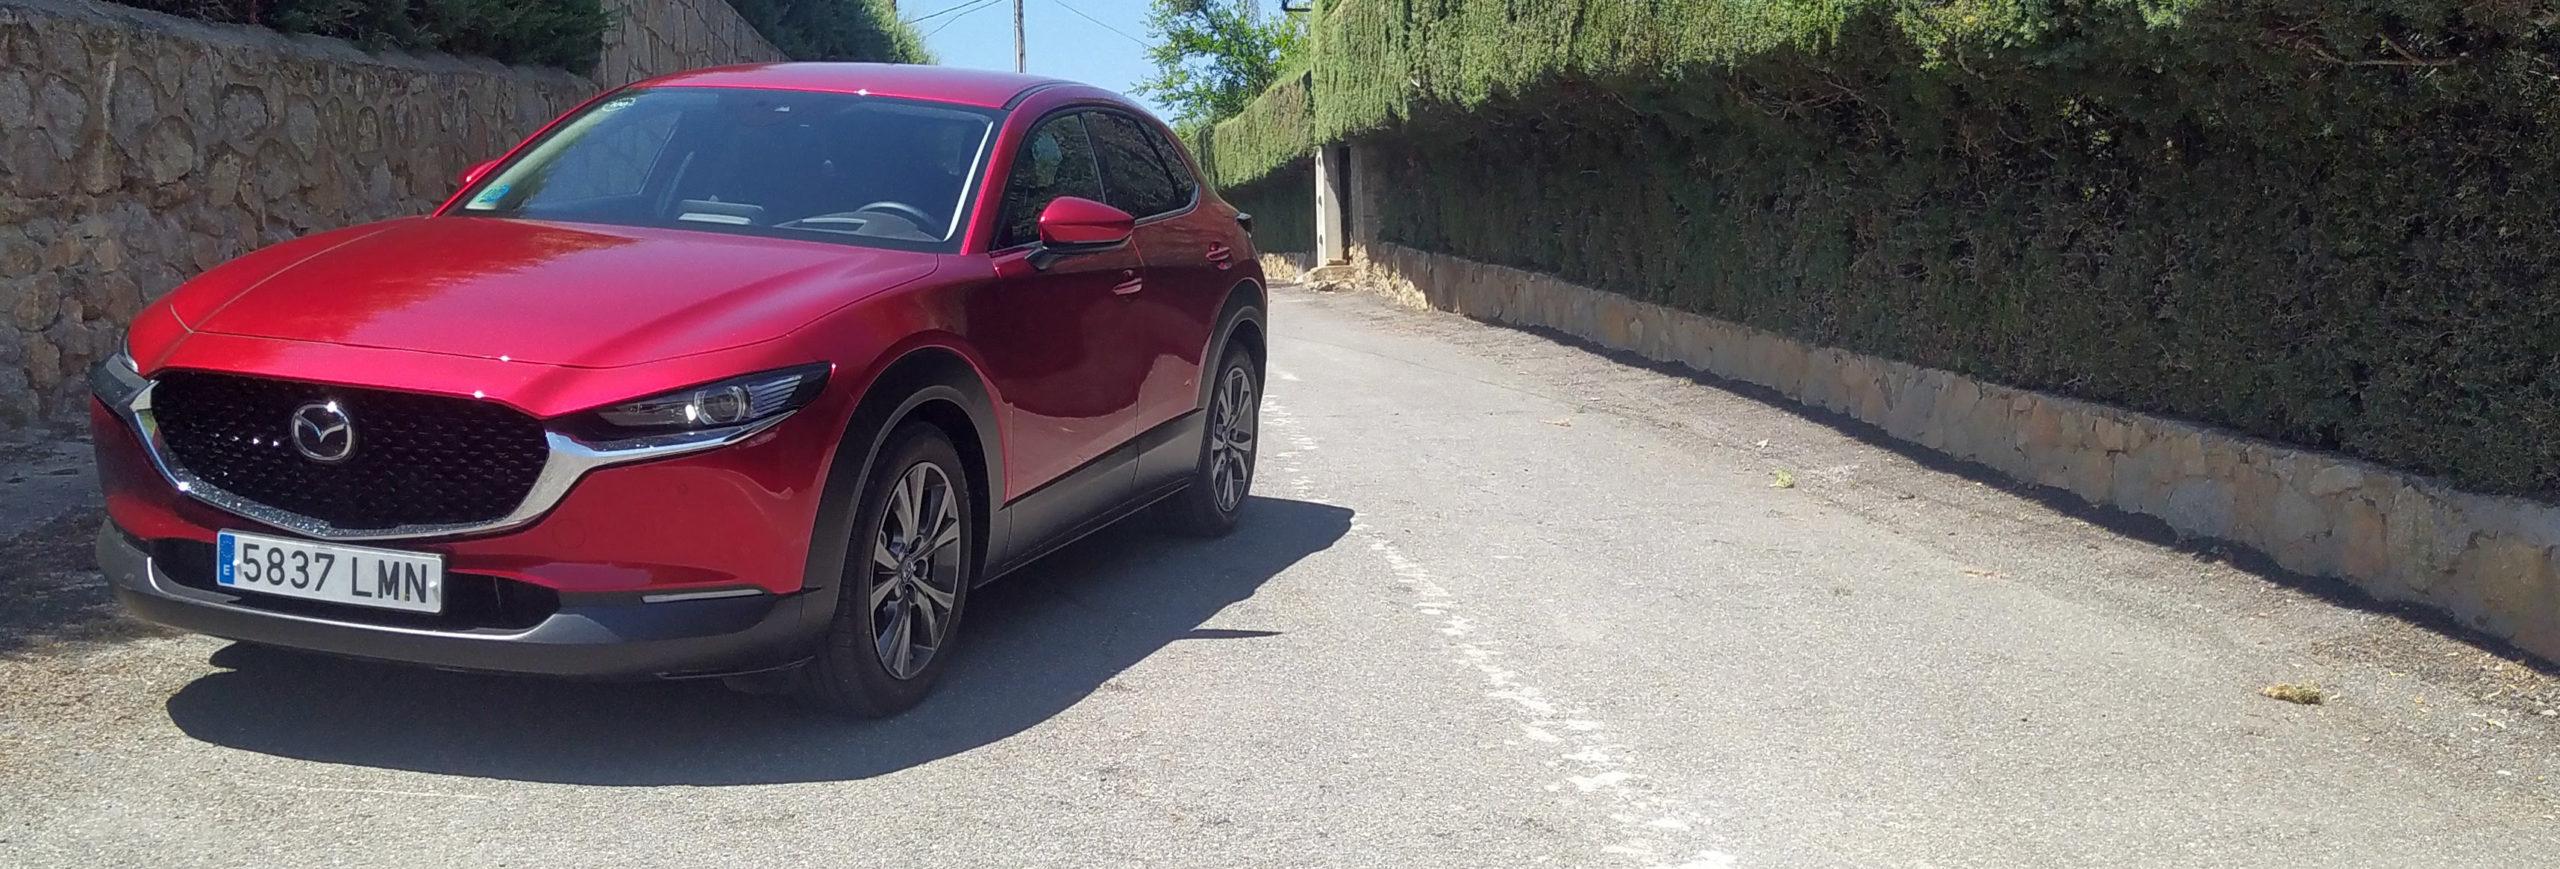 TestDrive - Mazda CX-30 con el motor revolucionario e-Skyactiv X